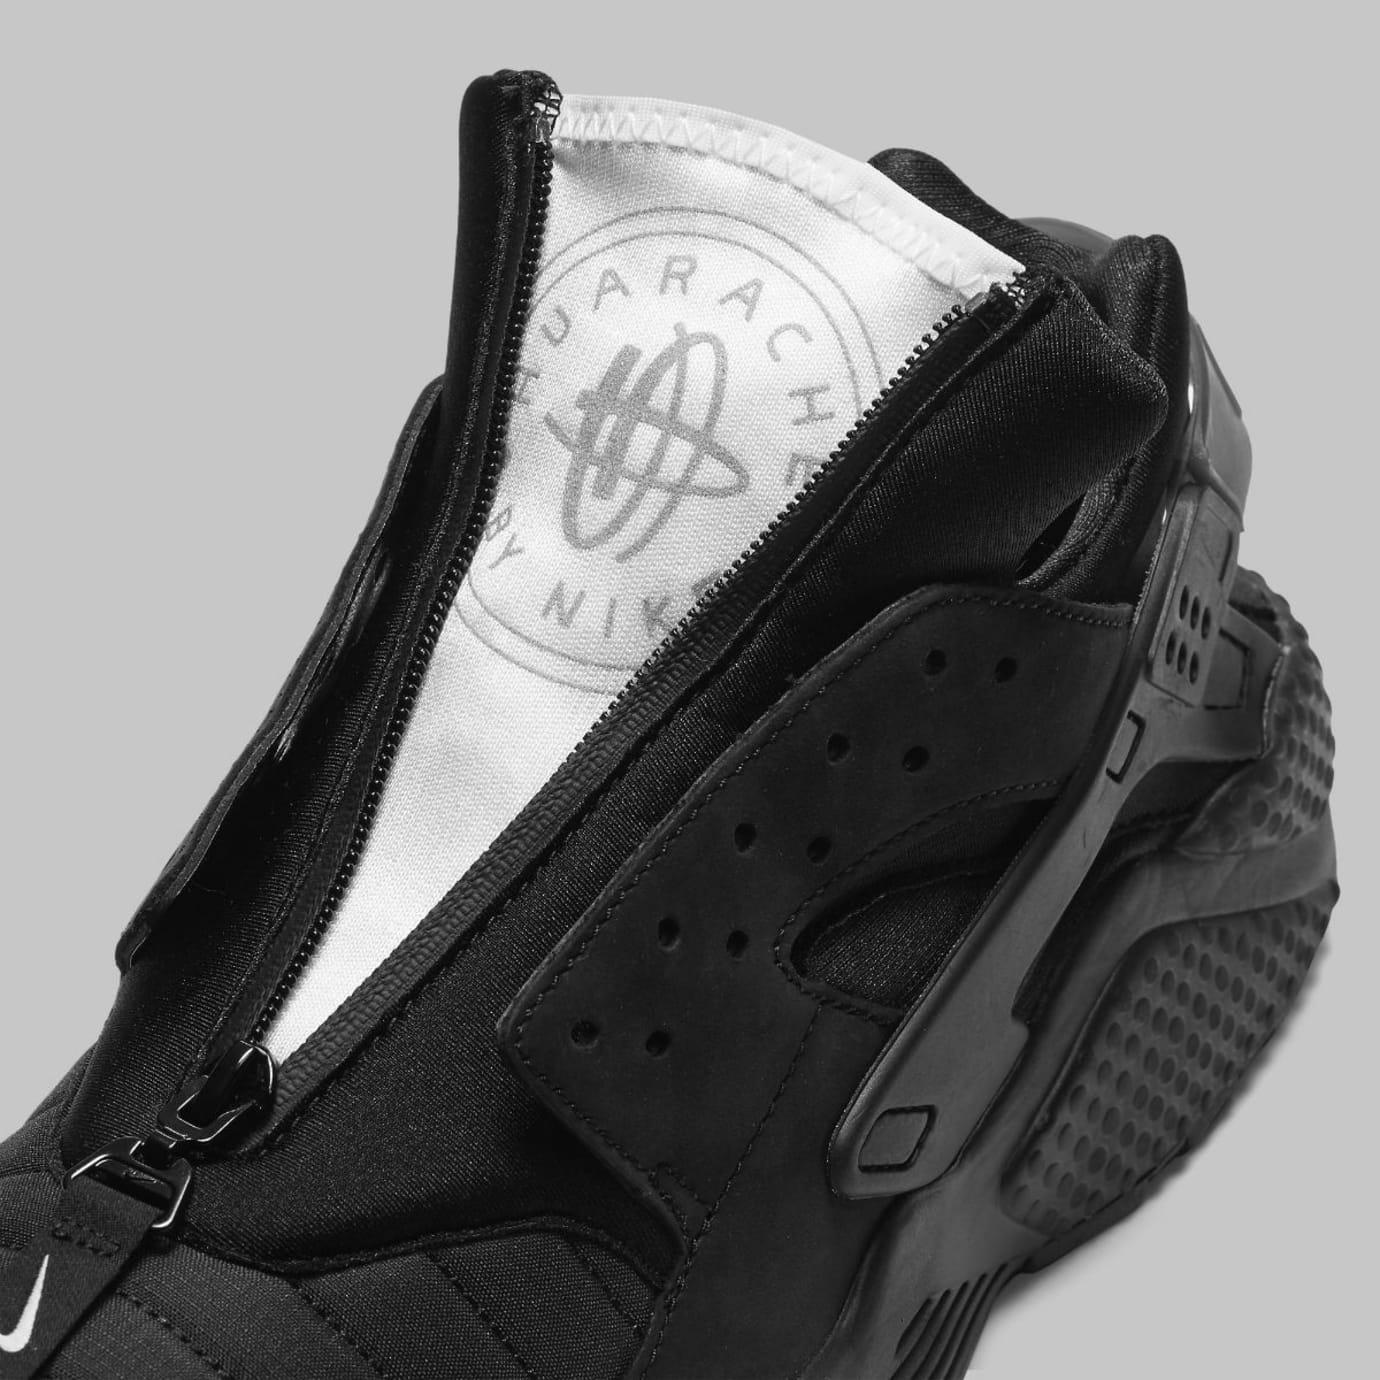 Nike Air Huarache Run NYC Triple Black Release Date AJ5578-001 Tongue b6148ca26